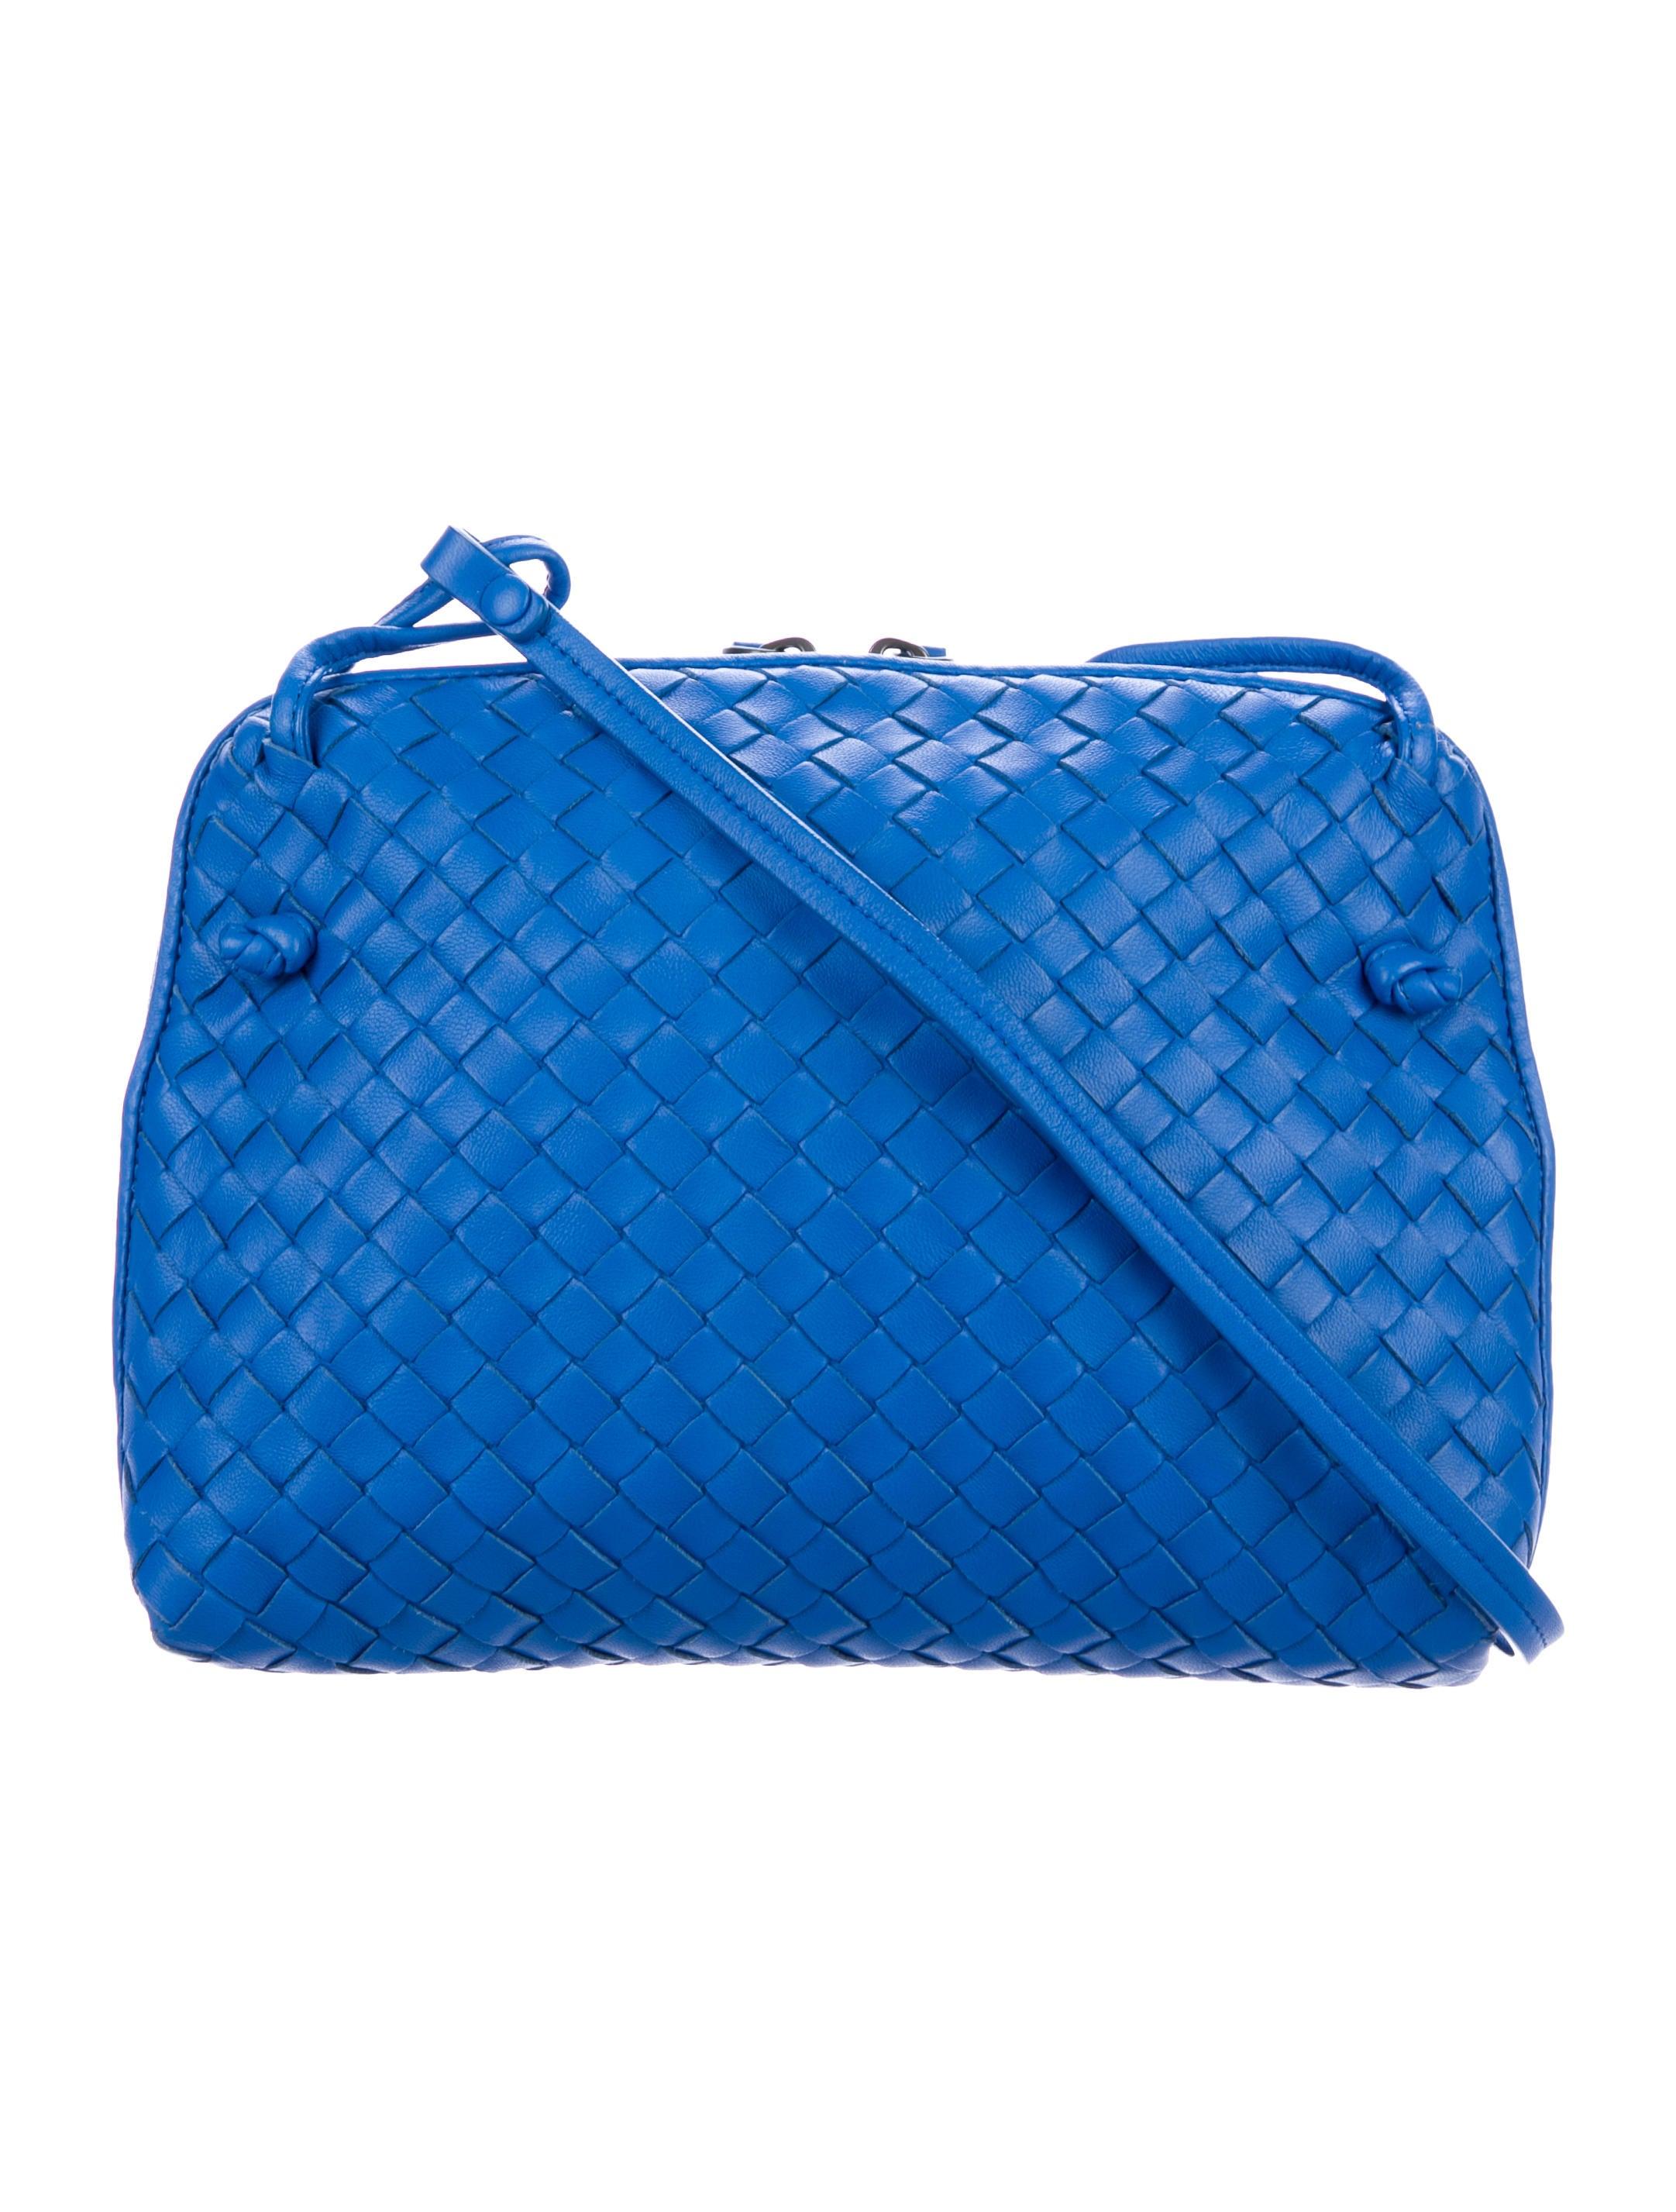 1970873192a Bottega Veneta Intrecciato Nodini Bag - Handbags - BOT59013   The ...